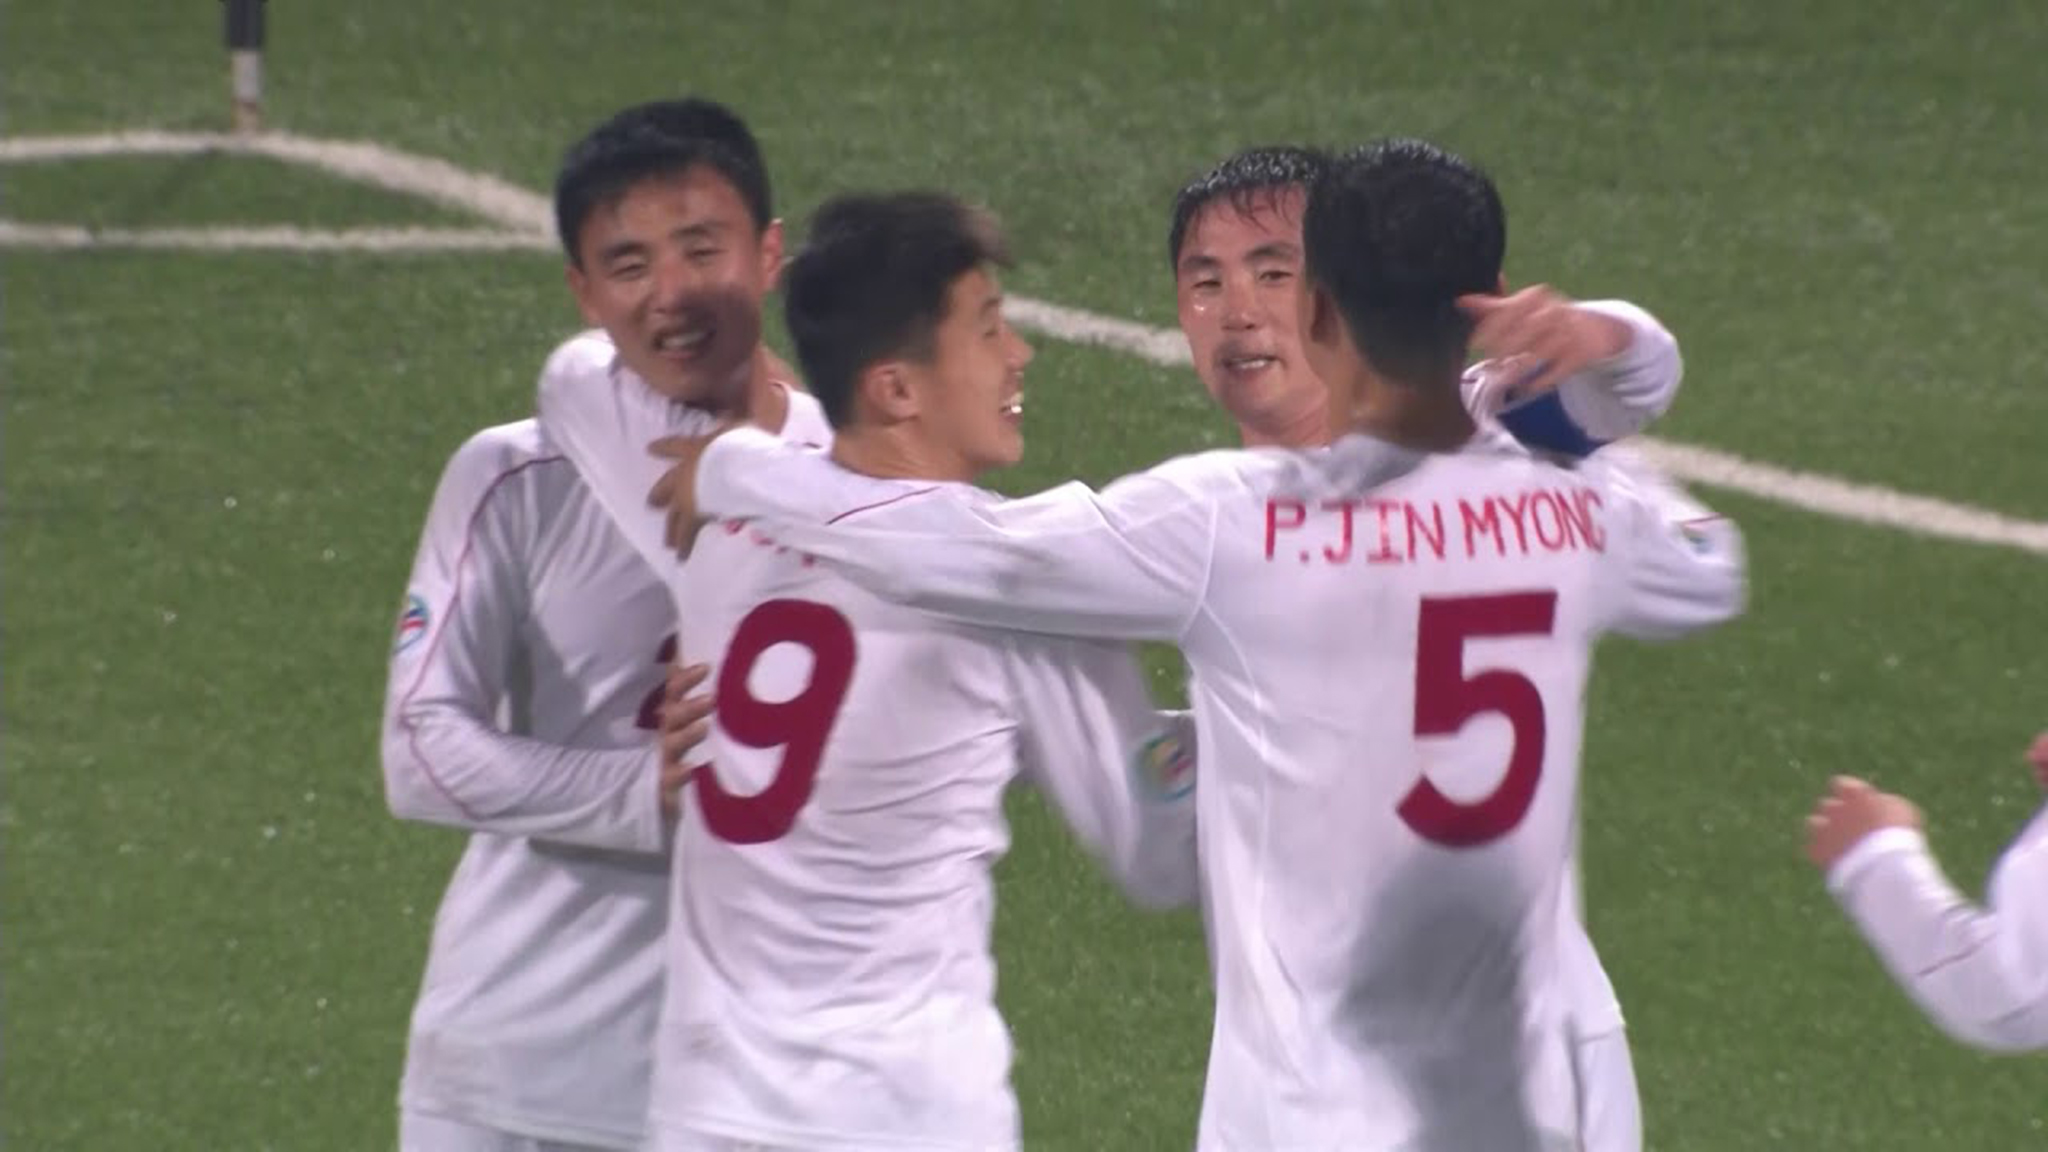 Benfica de Macau perde por 8-0 frente aos norte-coreanos 25 de Abril